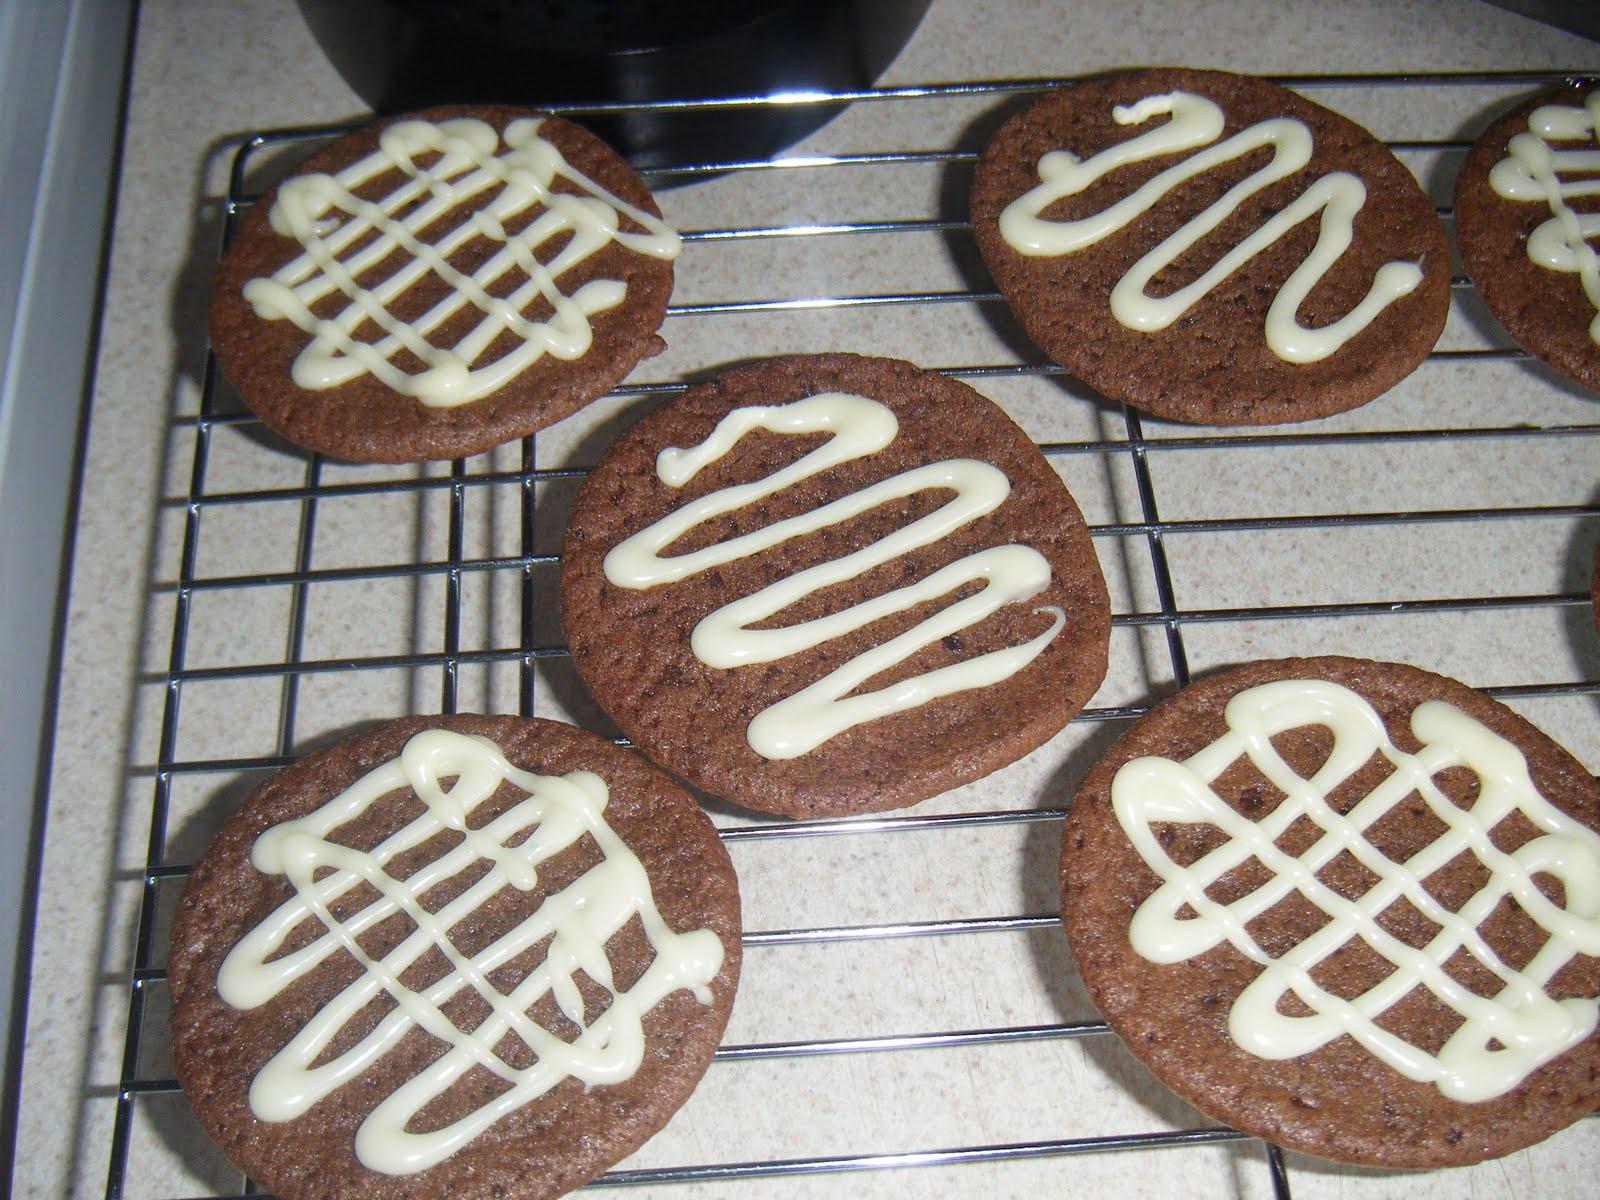 http://3.bp.blogspot.com/-RMyZp94f_Yk/TjmS8G8BKzI/AAAAAAAAAHI/2fVoAJ94OiU/s1600/Double+chocolate+cookies+4.JPG